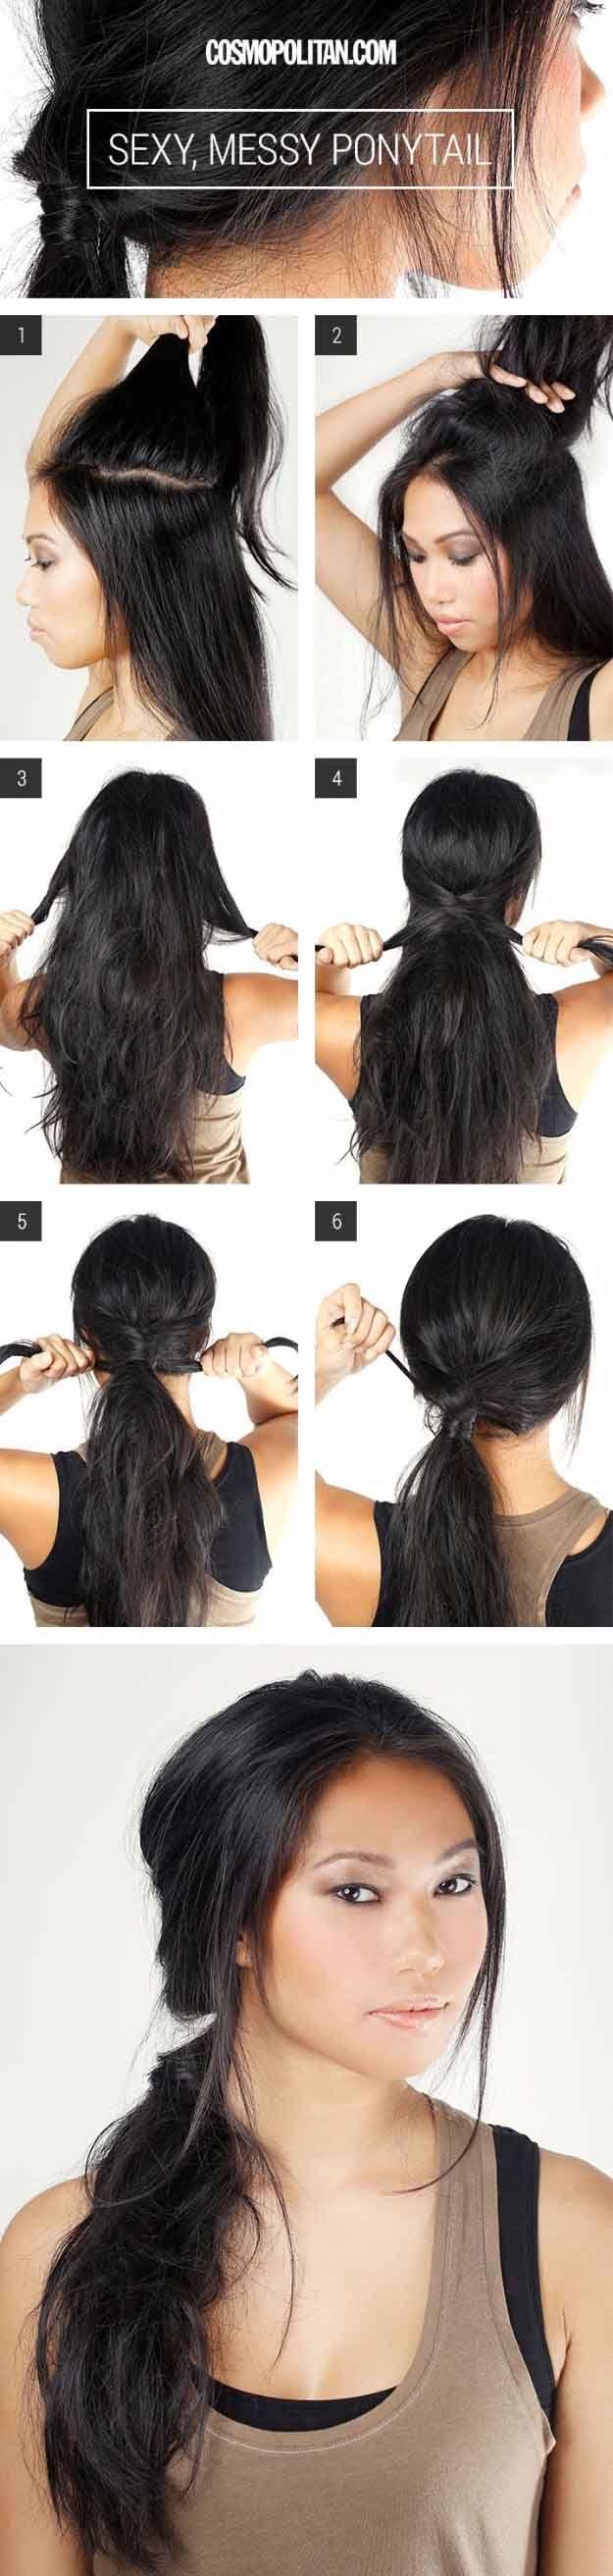 glam ponytail tutorials beauty